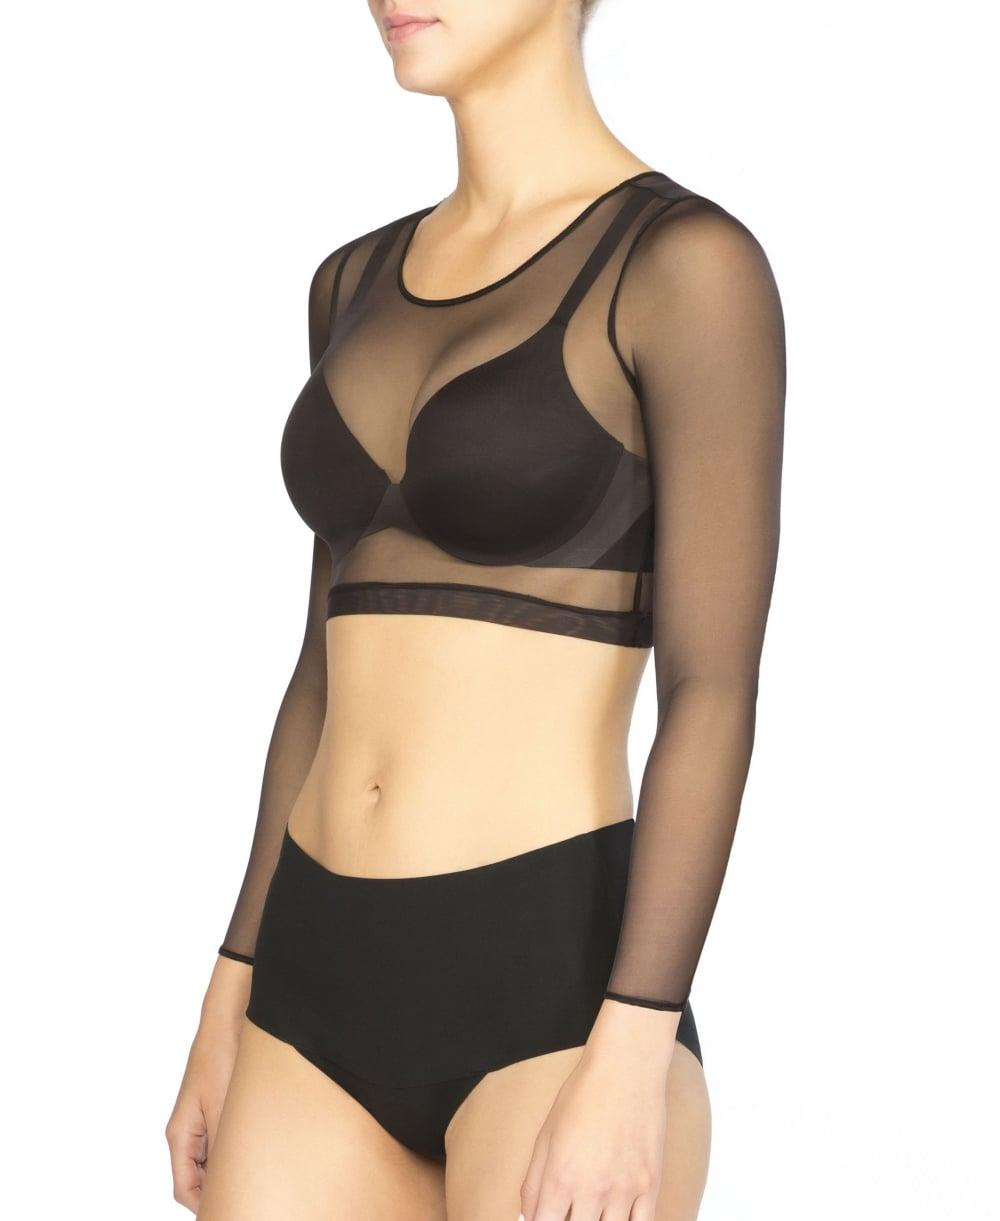 92c56309f0161 Spanx Sheer Fashion Mesh Crop Top - Clothing from luxury-legs.com UK